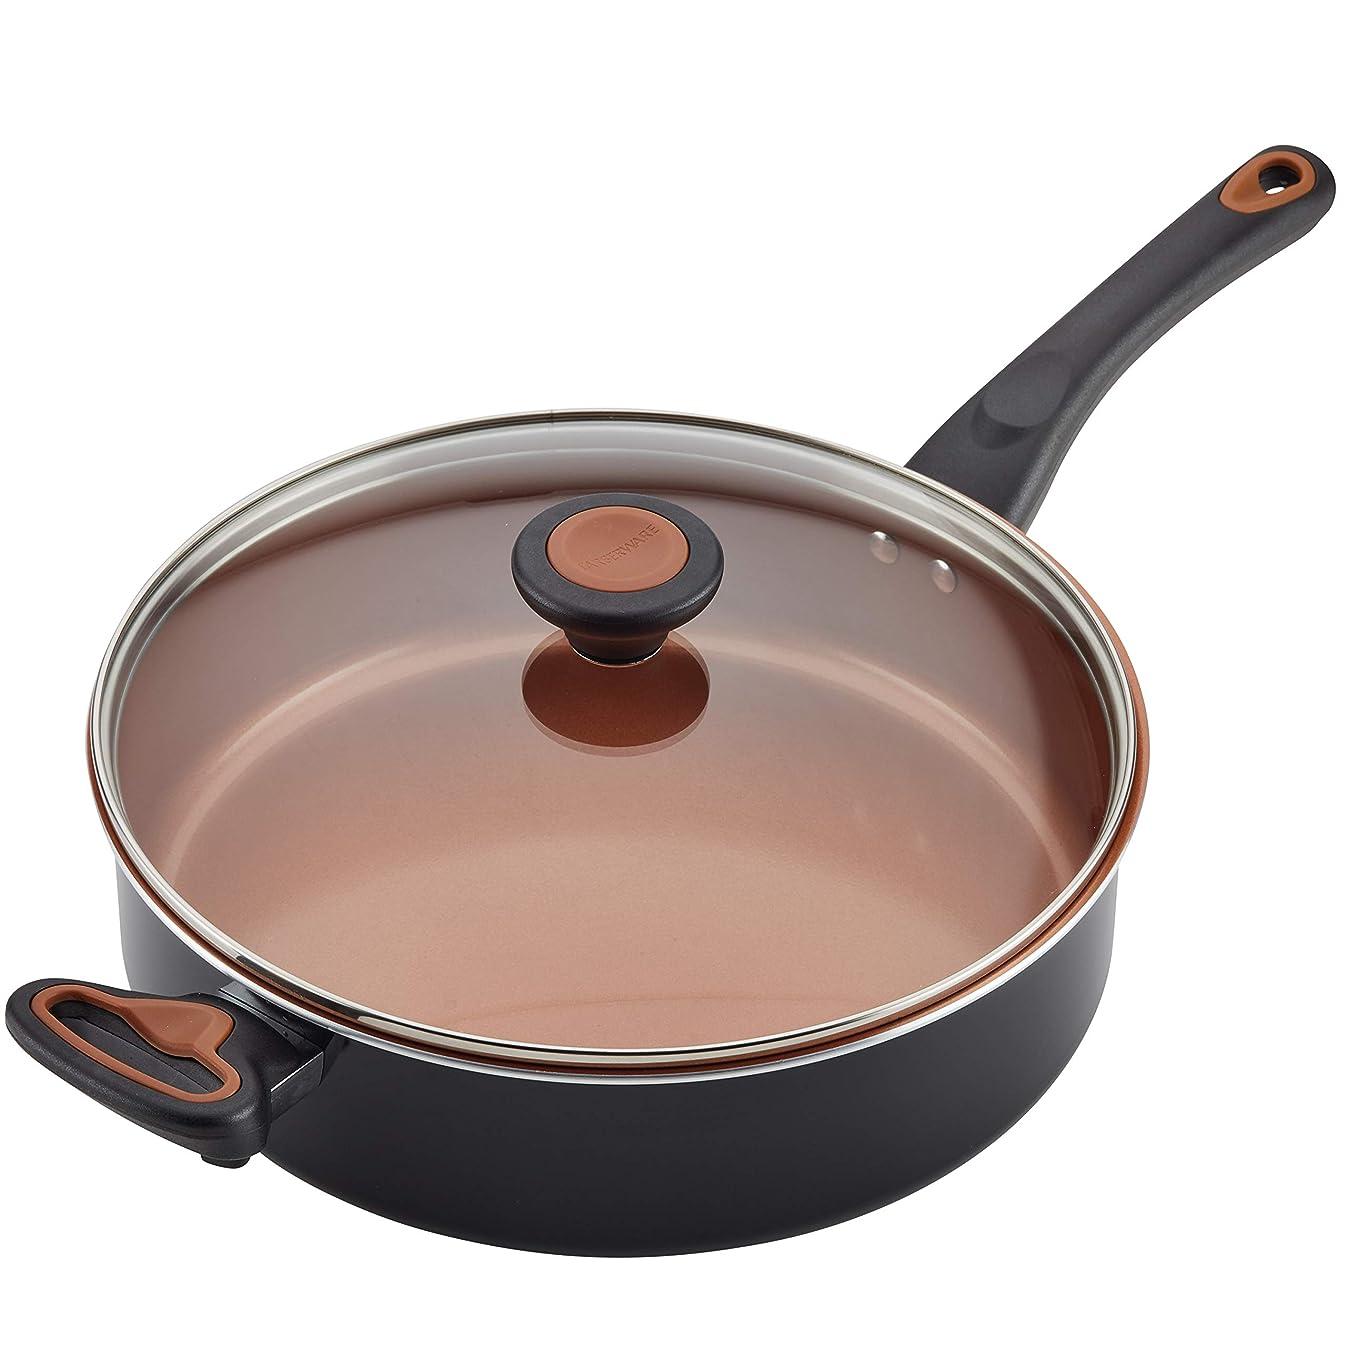 Farberware Glide Copper Ceramic Nonstick Covered Sauté with Helper Handle, 4-Quart, Black